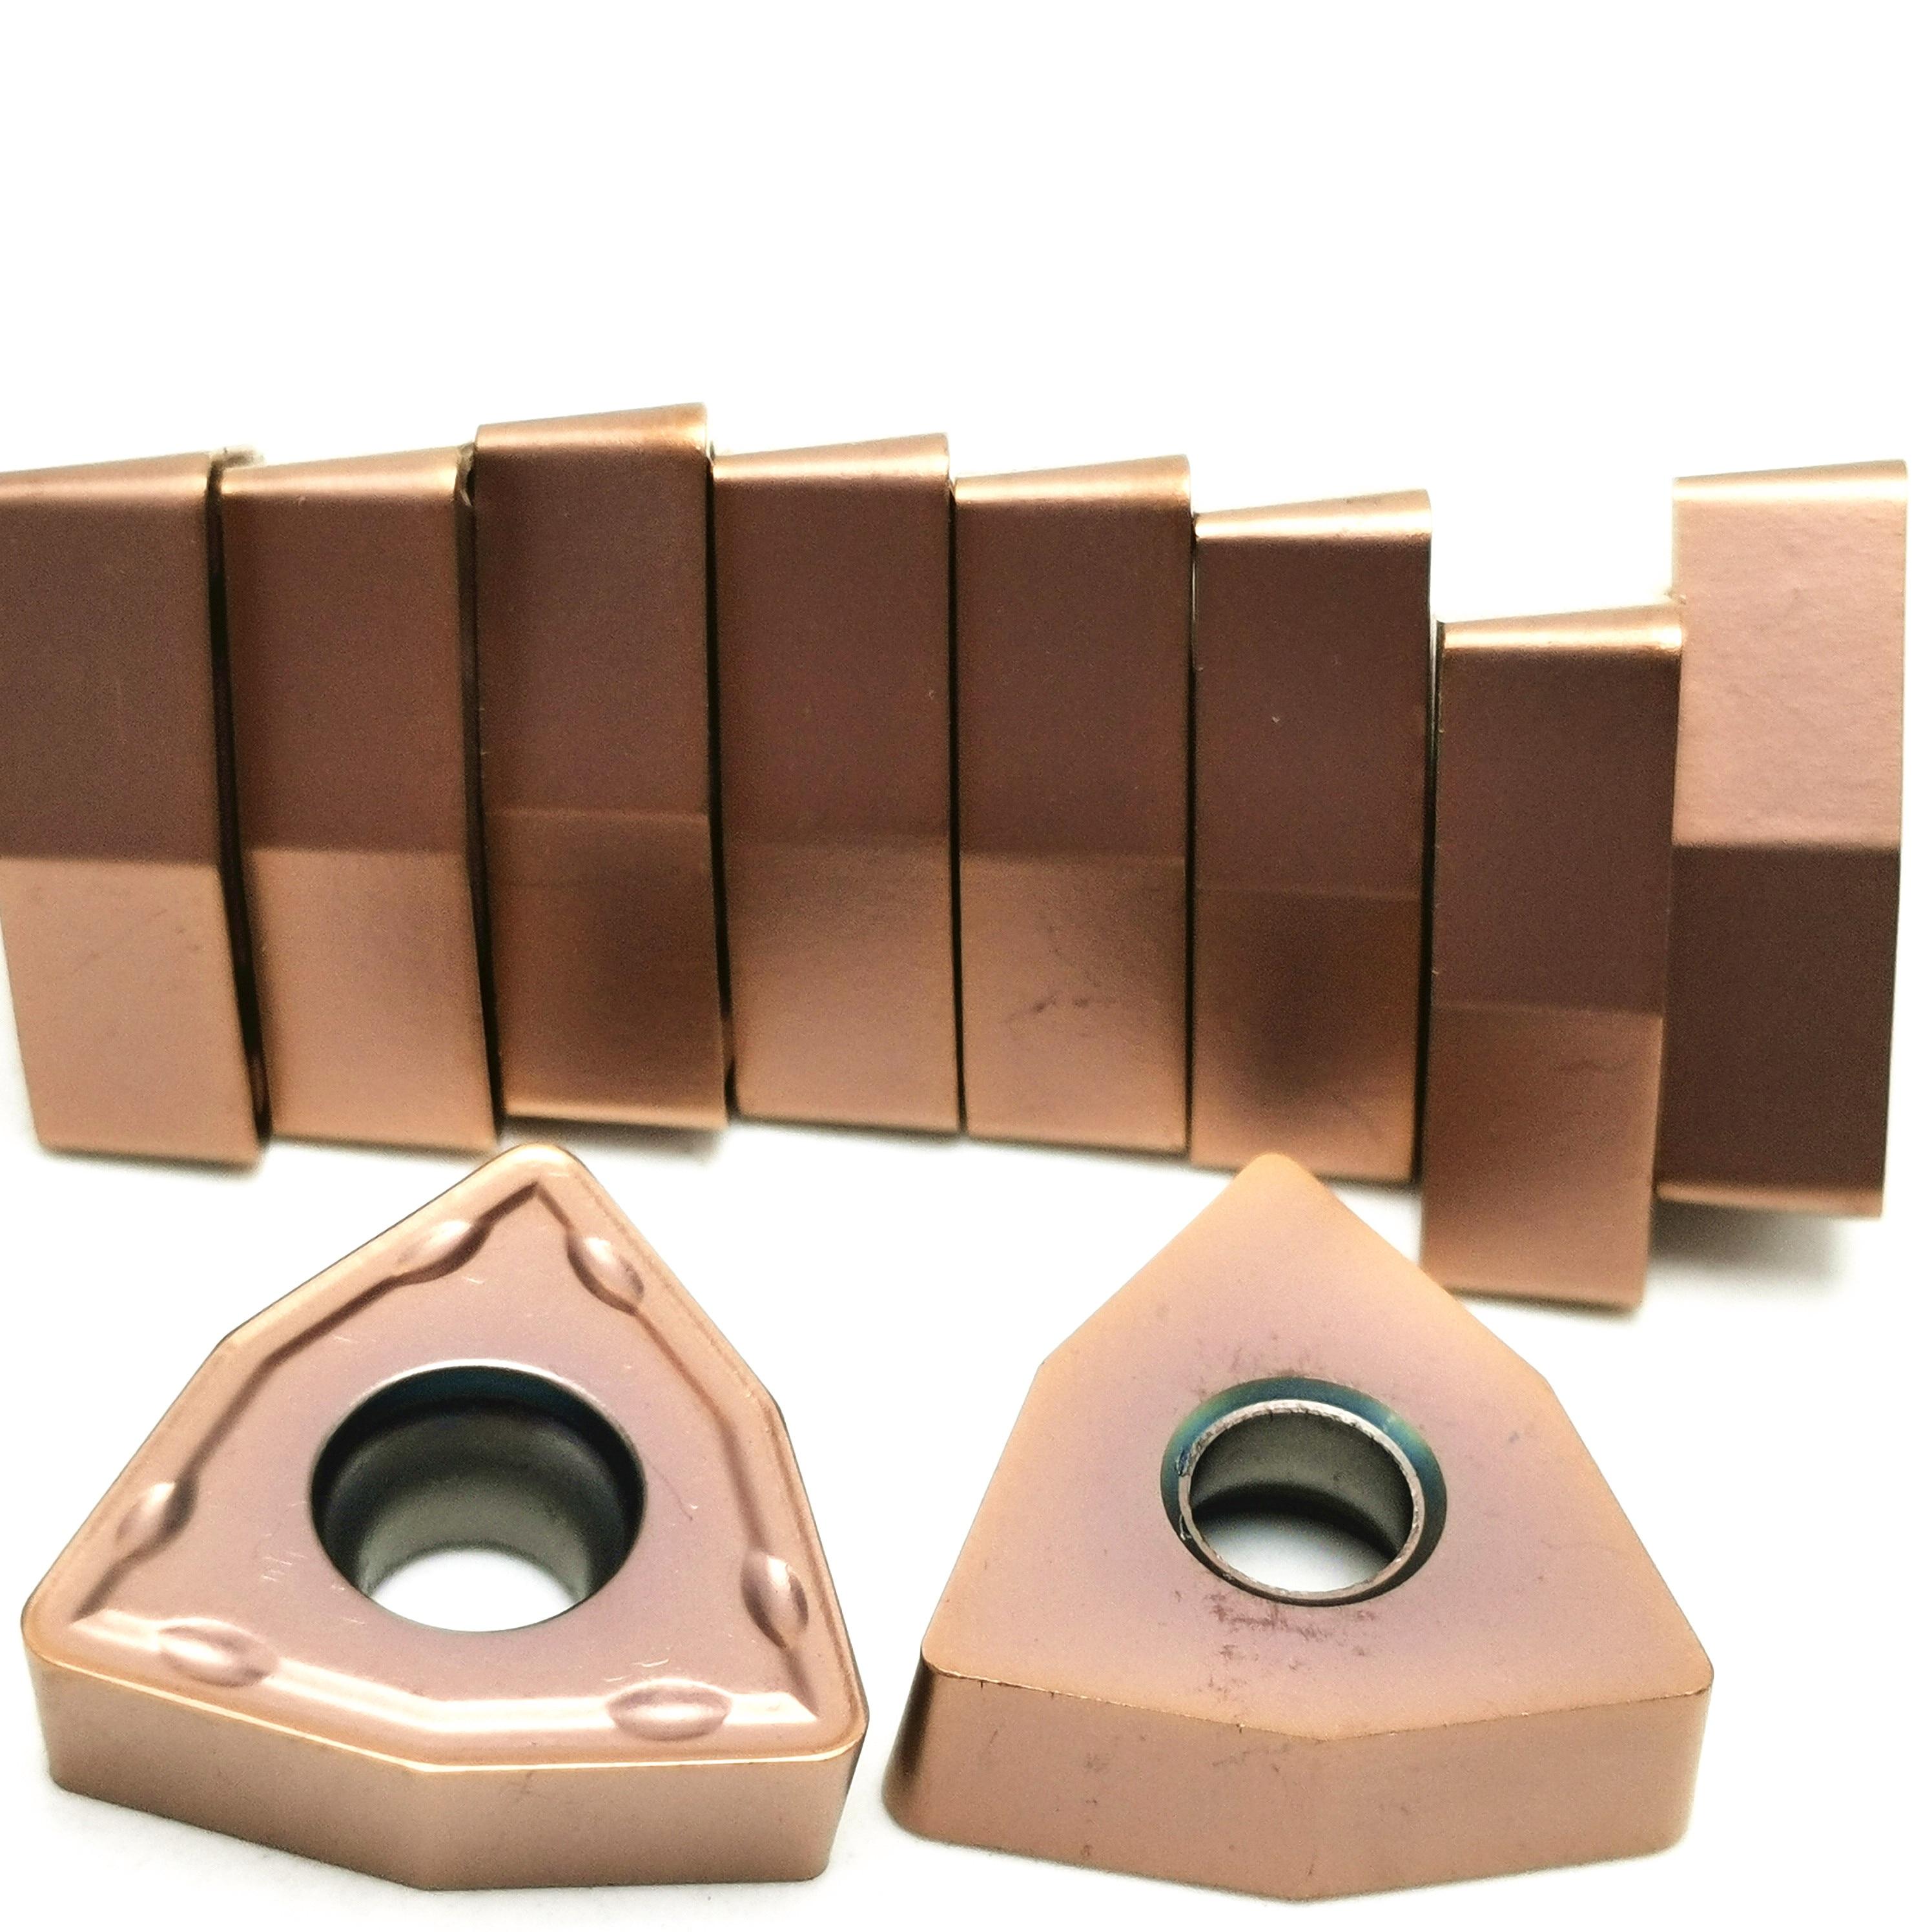 Купить с кэшбэком U Drill WCMX030208 WCMX040208 WCMX050308 WCMX06T308 WCMX080412 Carbide Inserts CNC Lathe Cutter for WC Type U Drill Bit